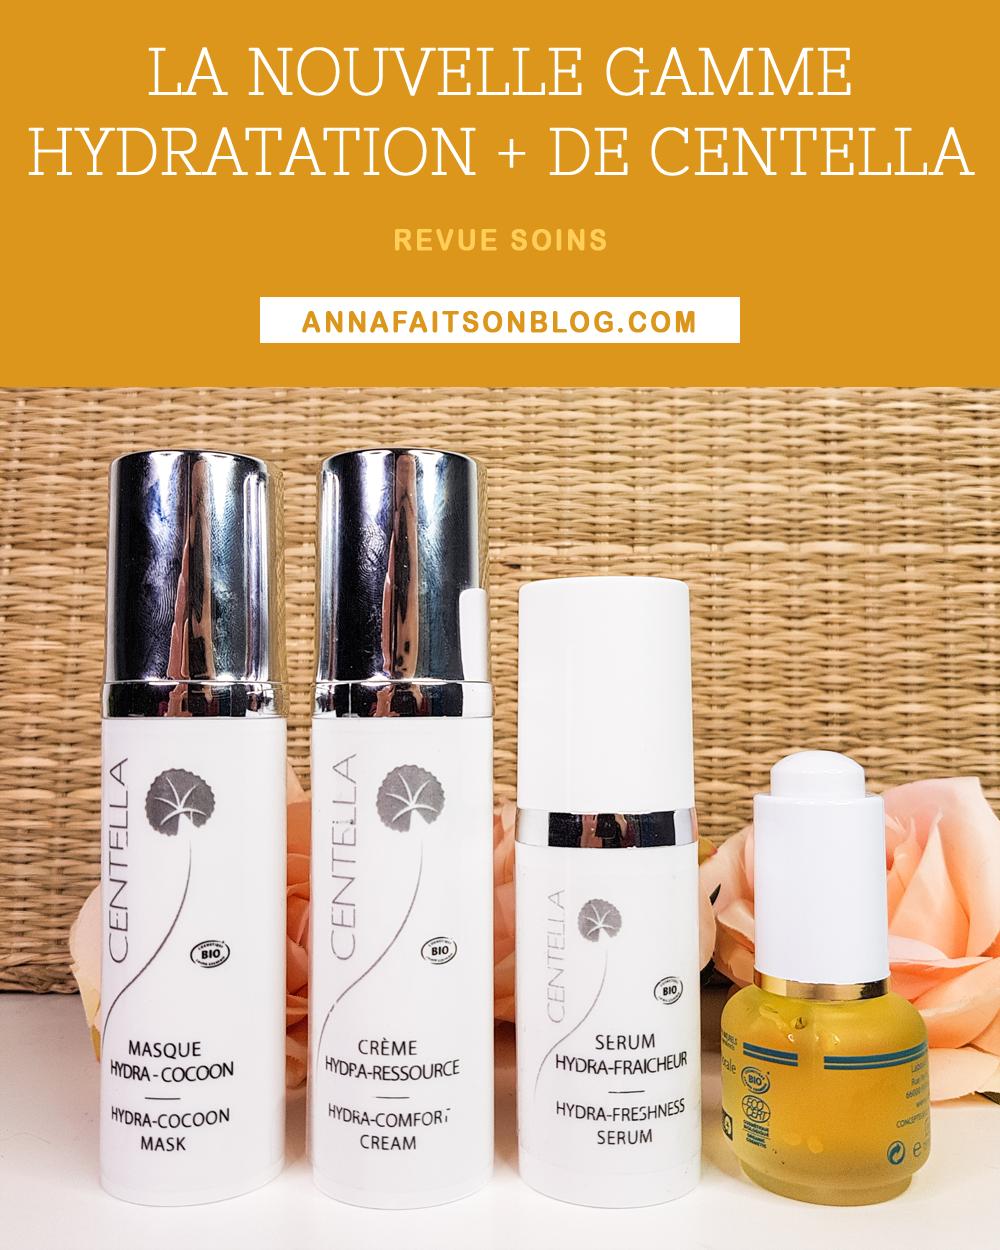 Gamme Hydratation + de Centella